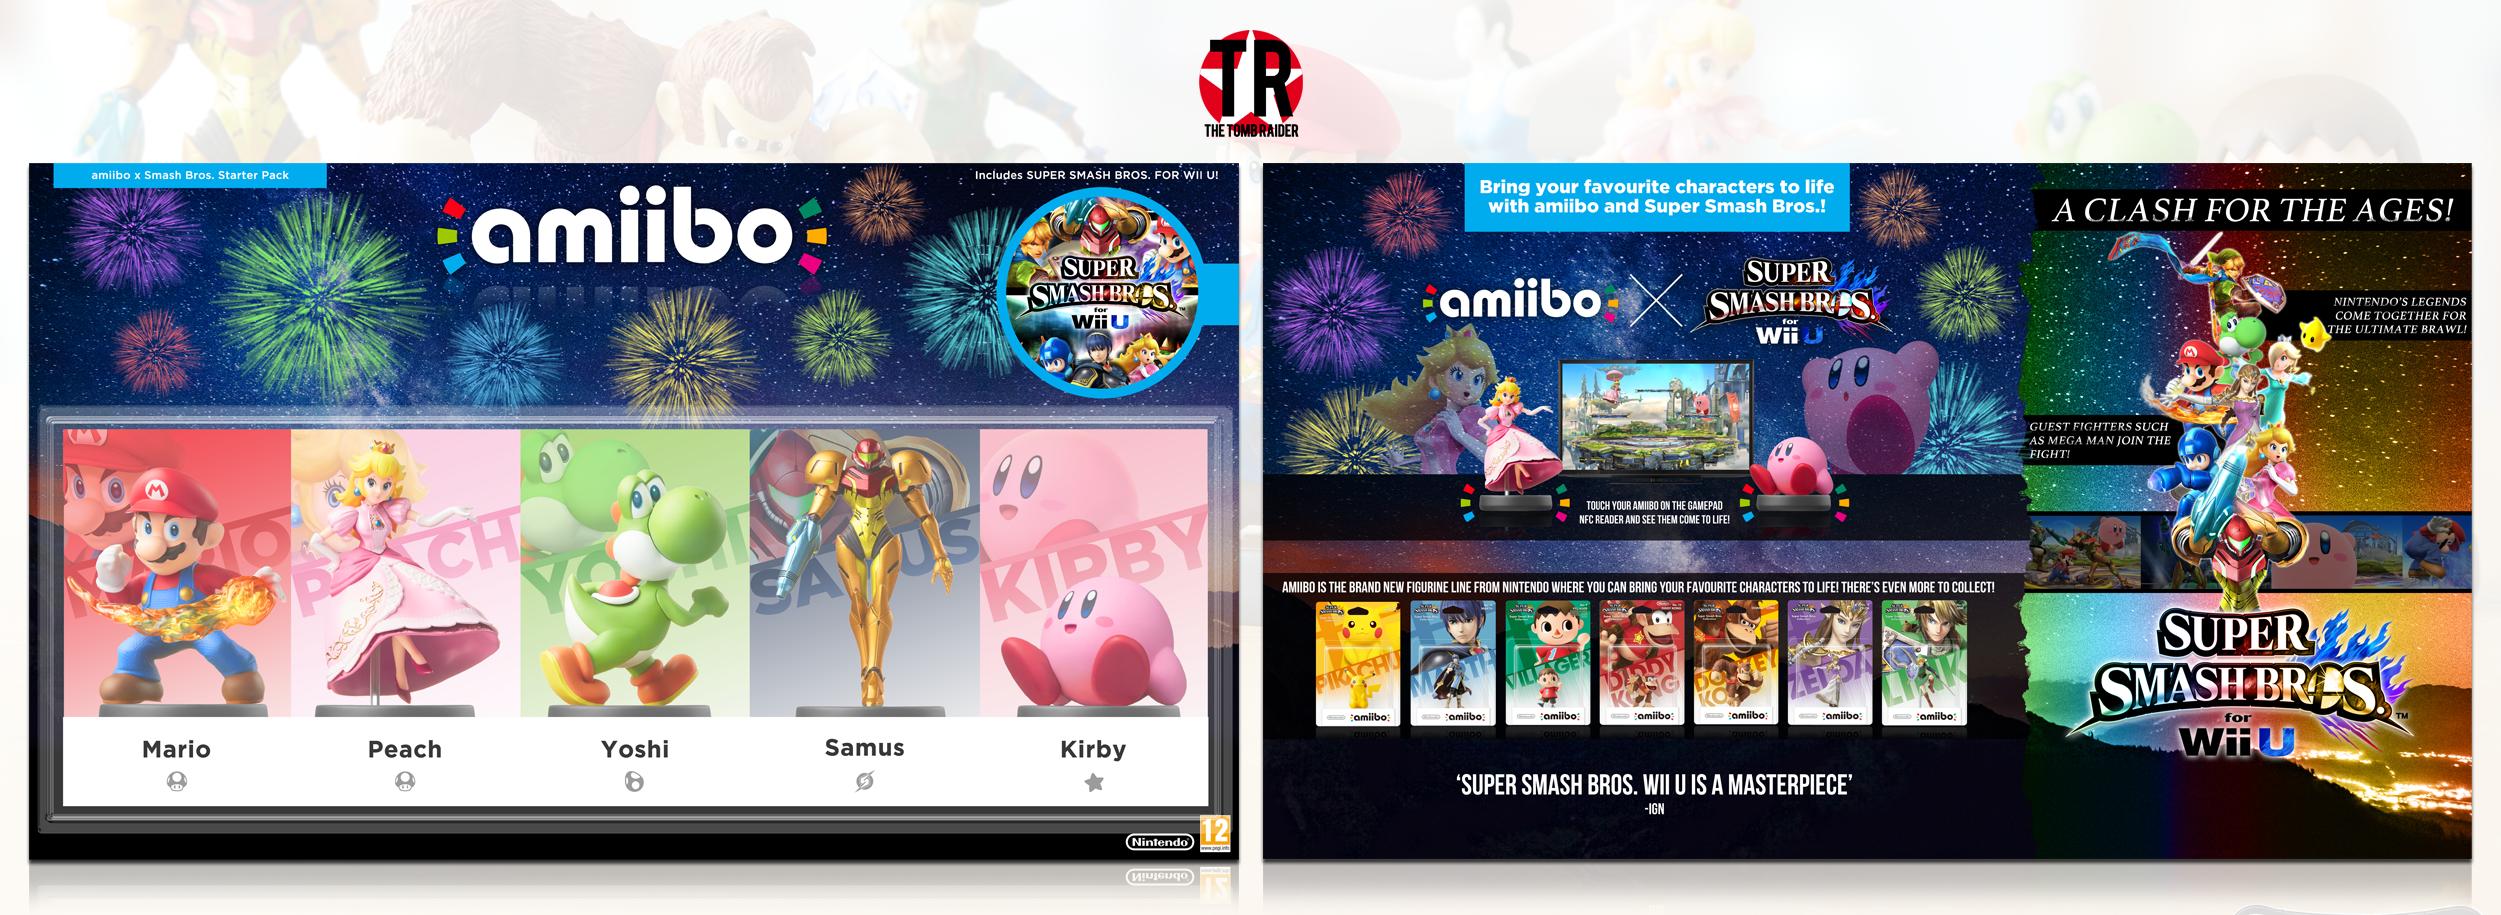 Amiibo X Super Smash Bros For Wii U Wii U Box Art Cover